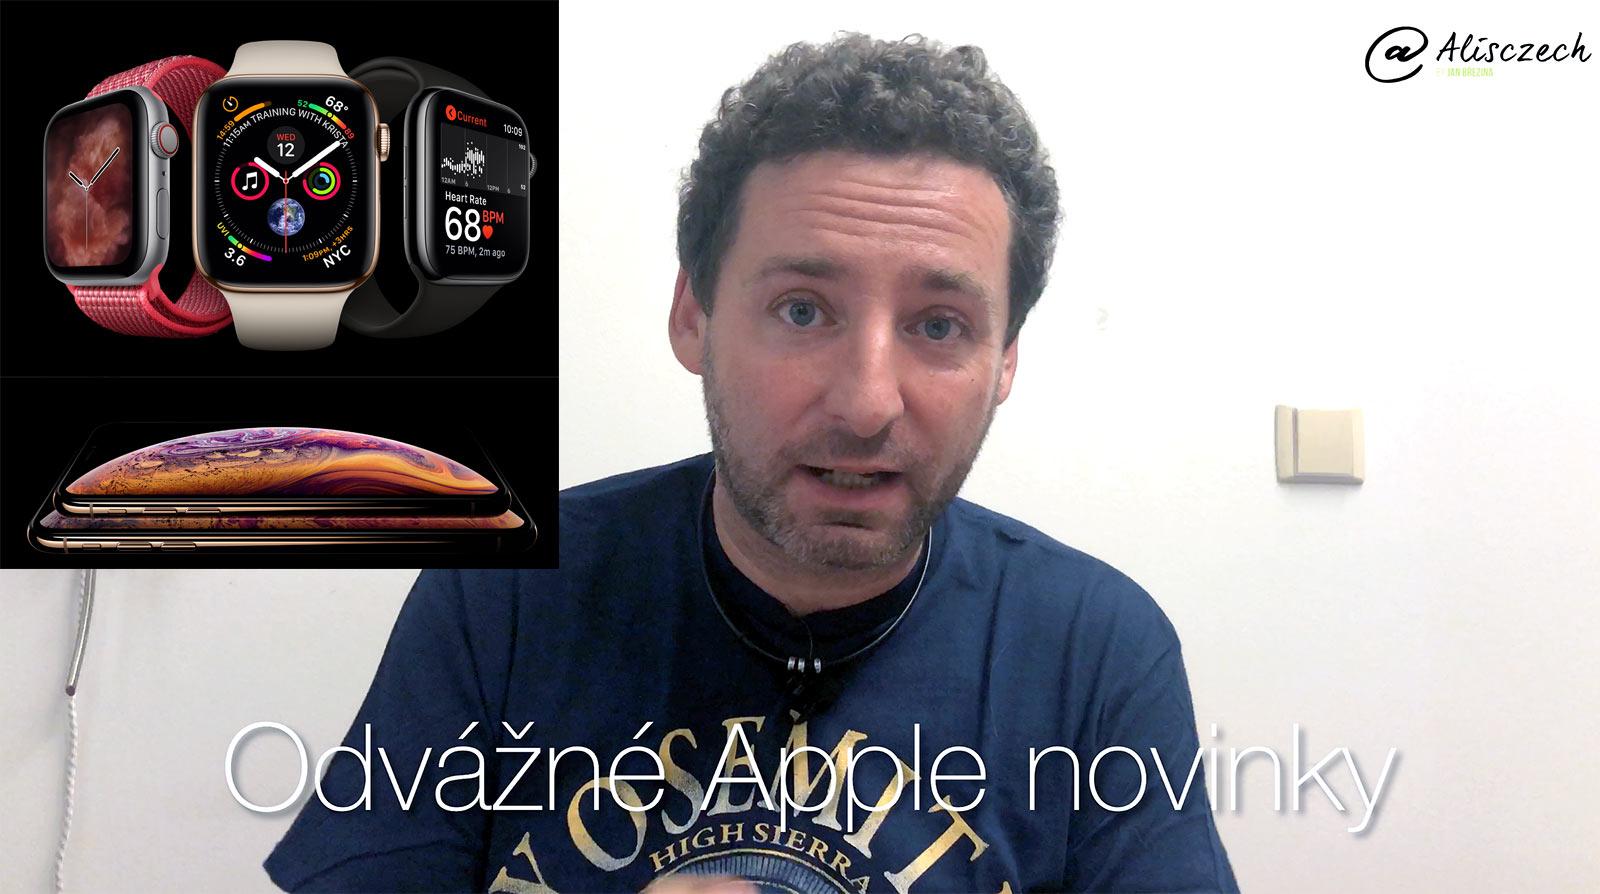 Alisczech 130 Apple Novinky